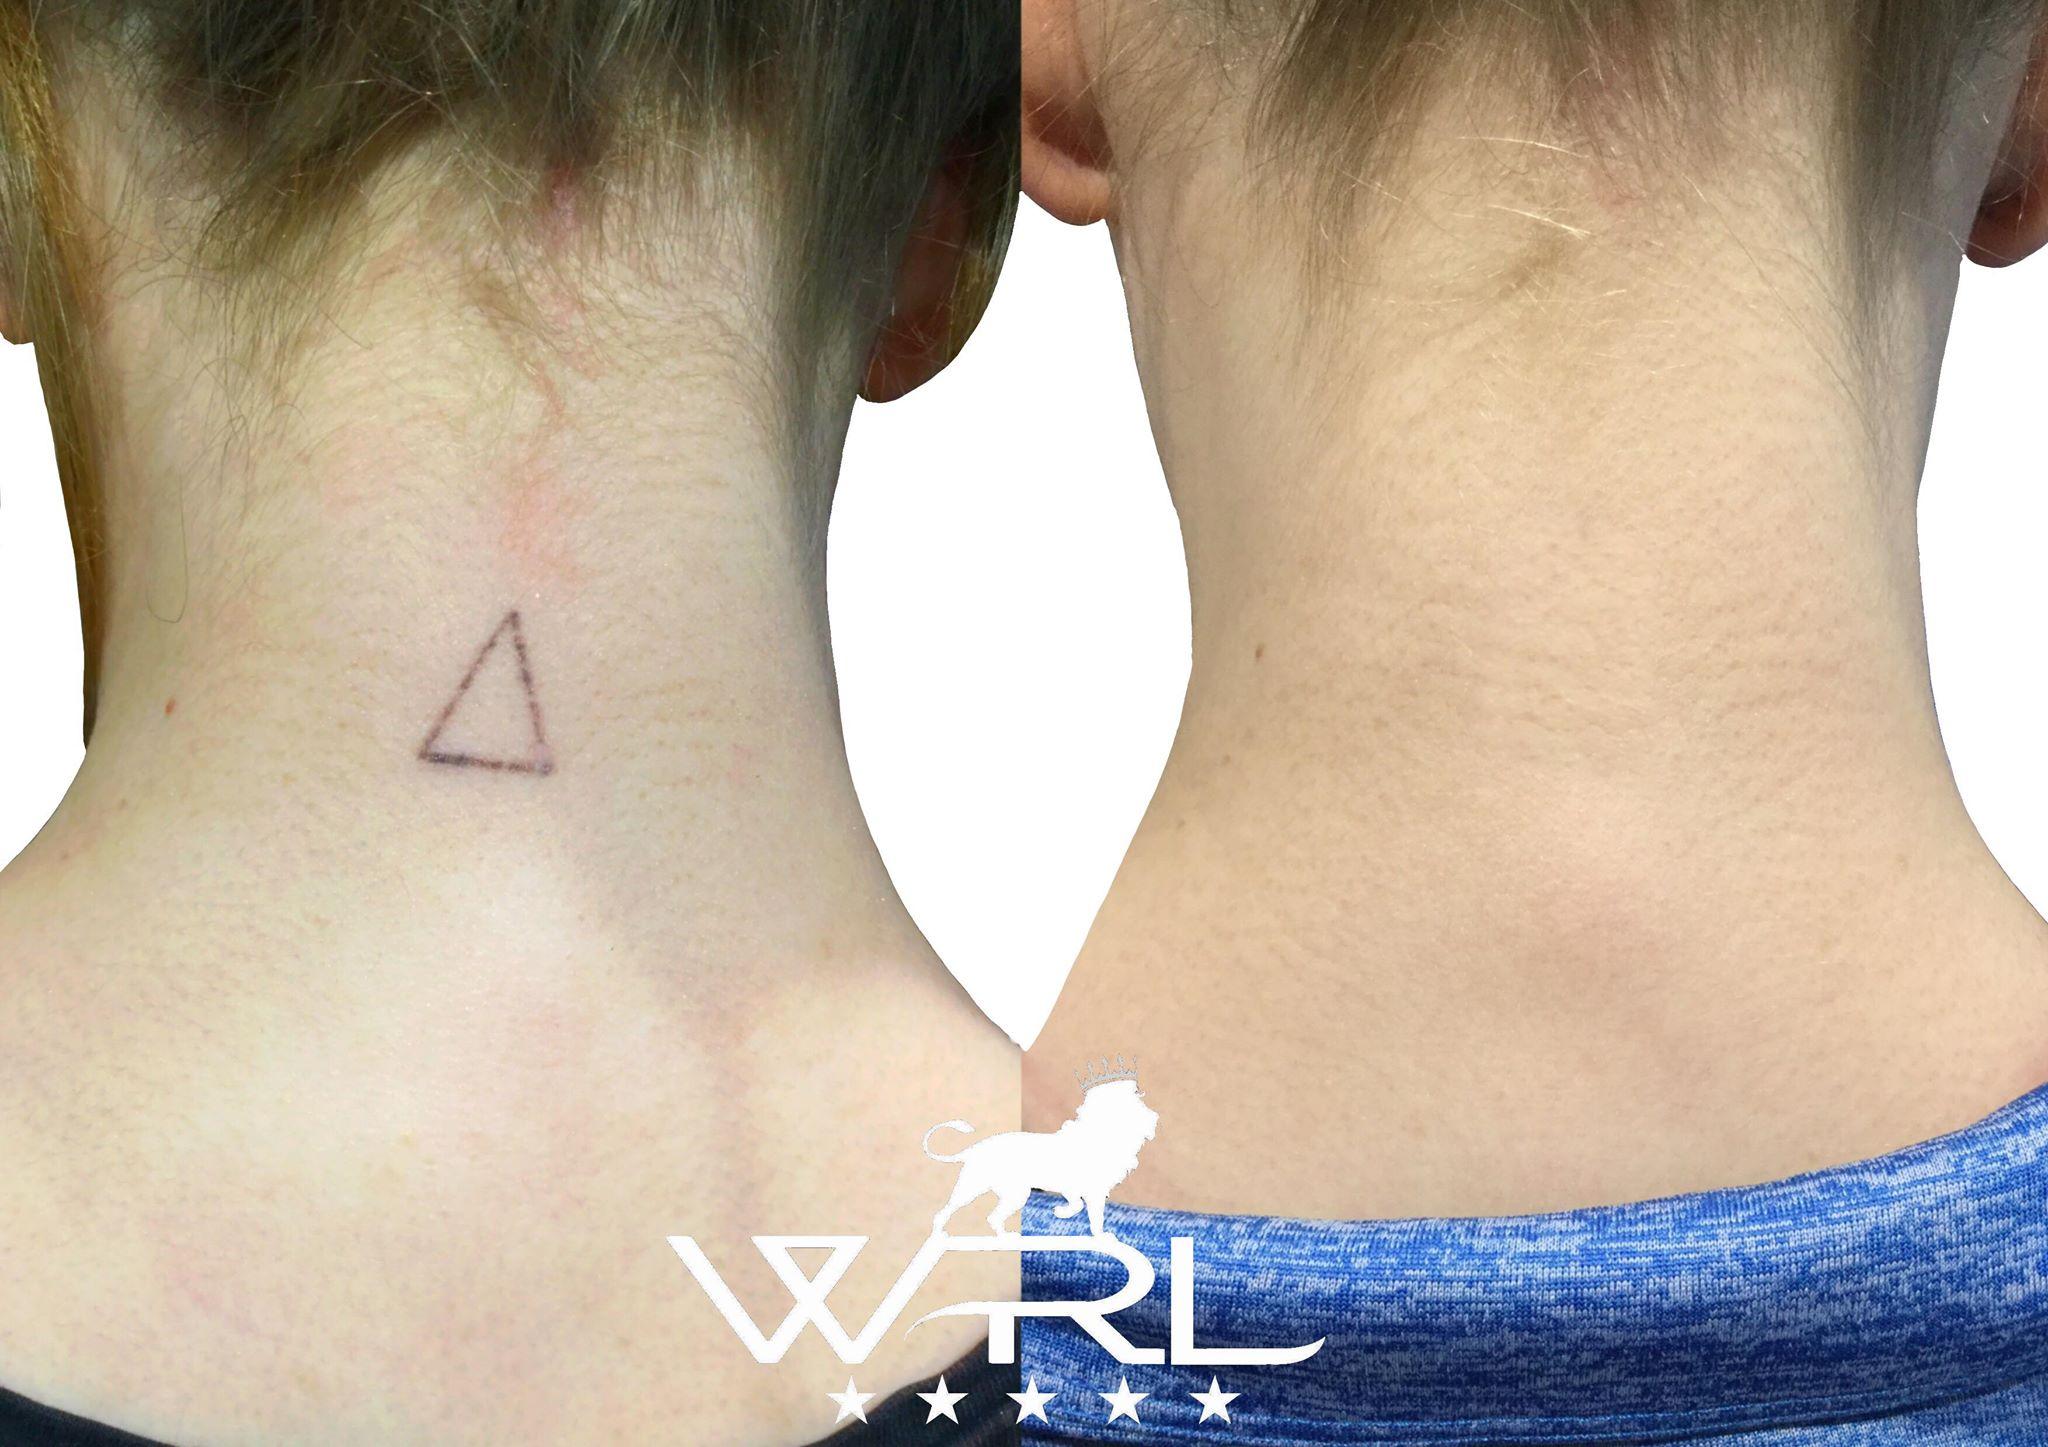 Laser Tattoo Removal, Neck Tattoo - Whiteroom Laser Ltd